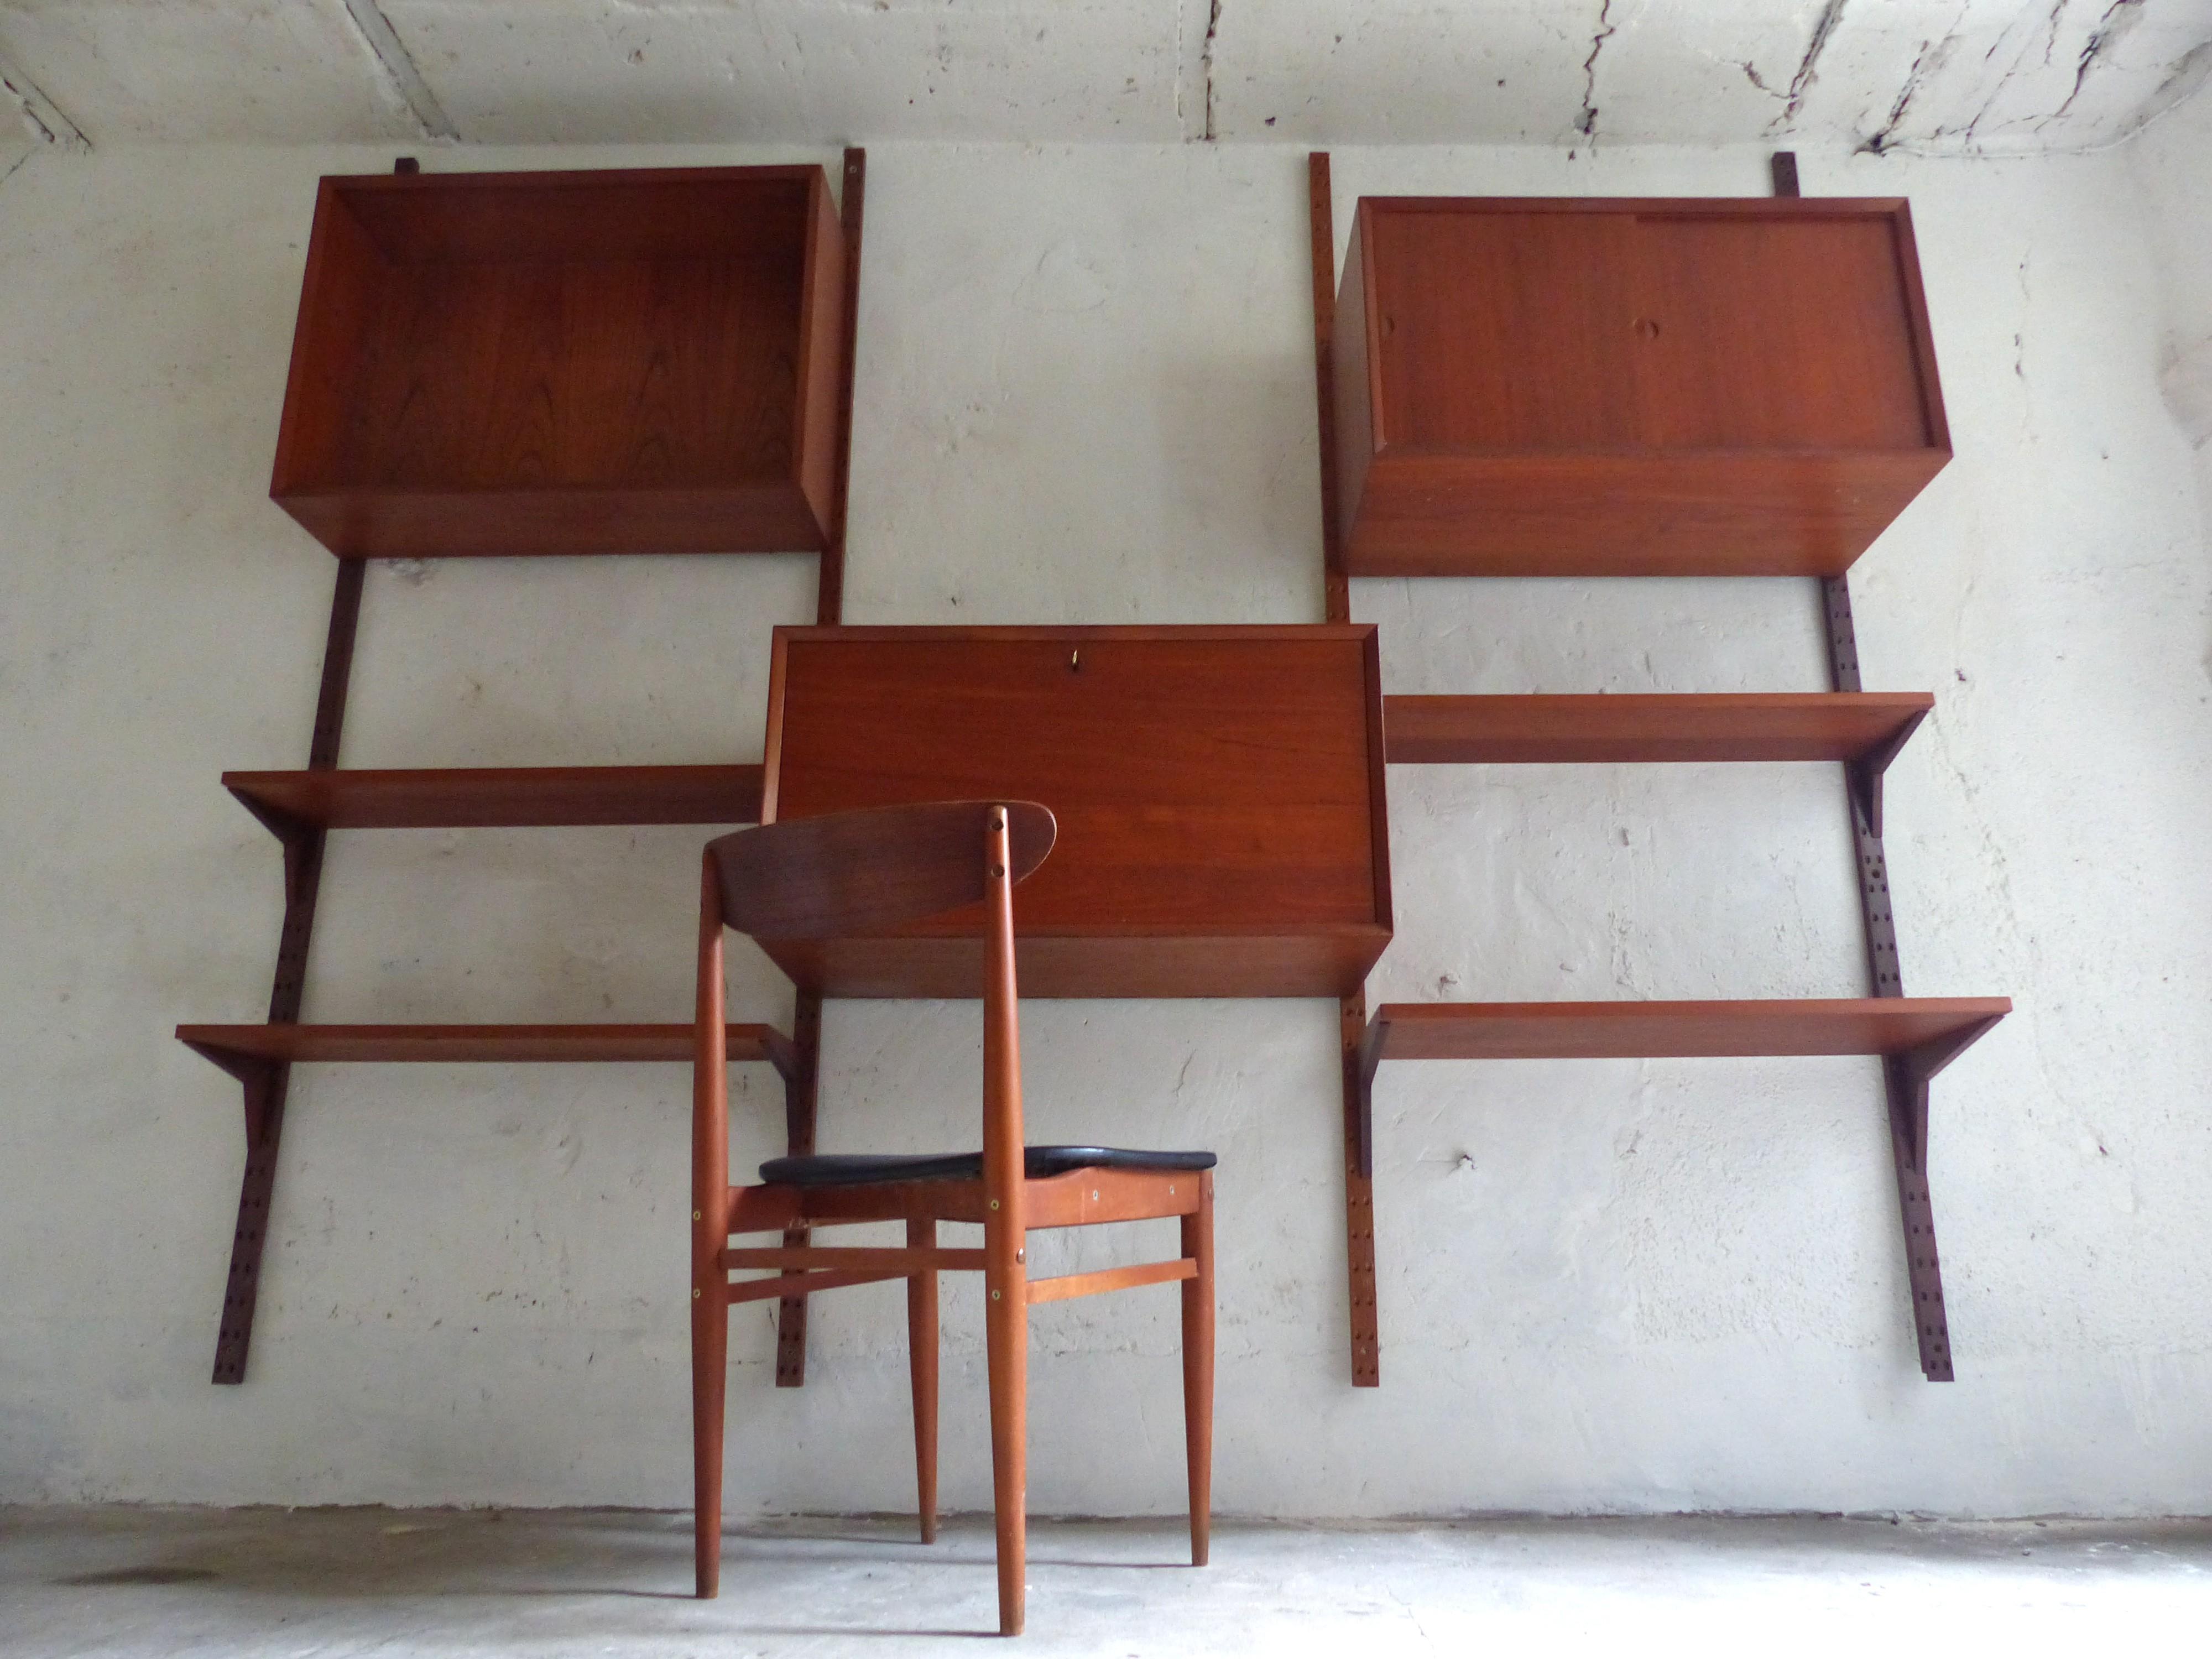 Scandinavian bookcase in teak, Poul CADOVIUS - 1960s ...